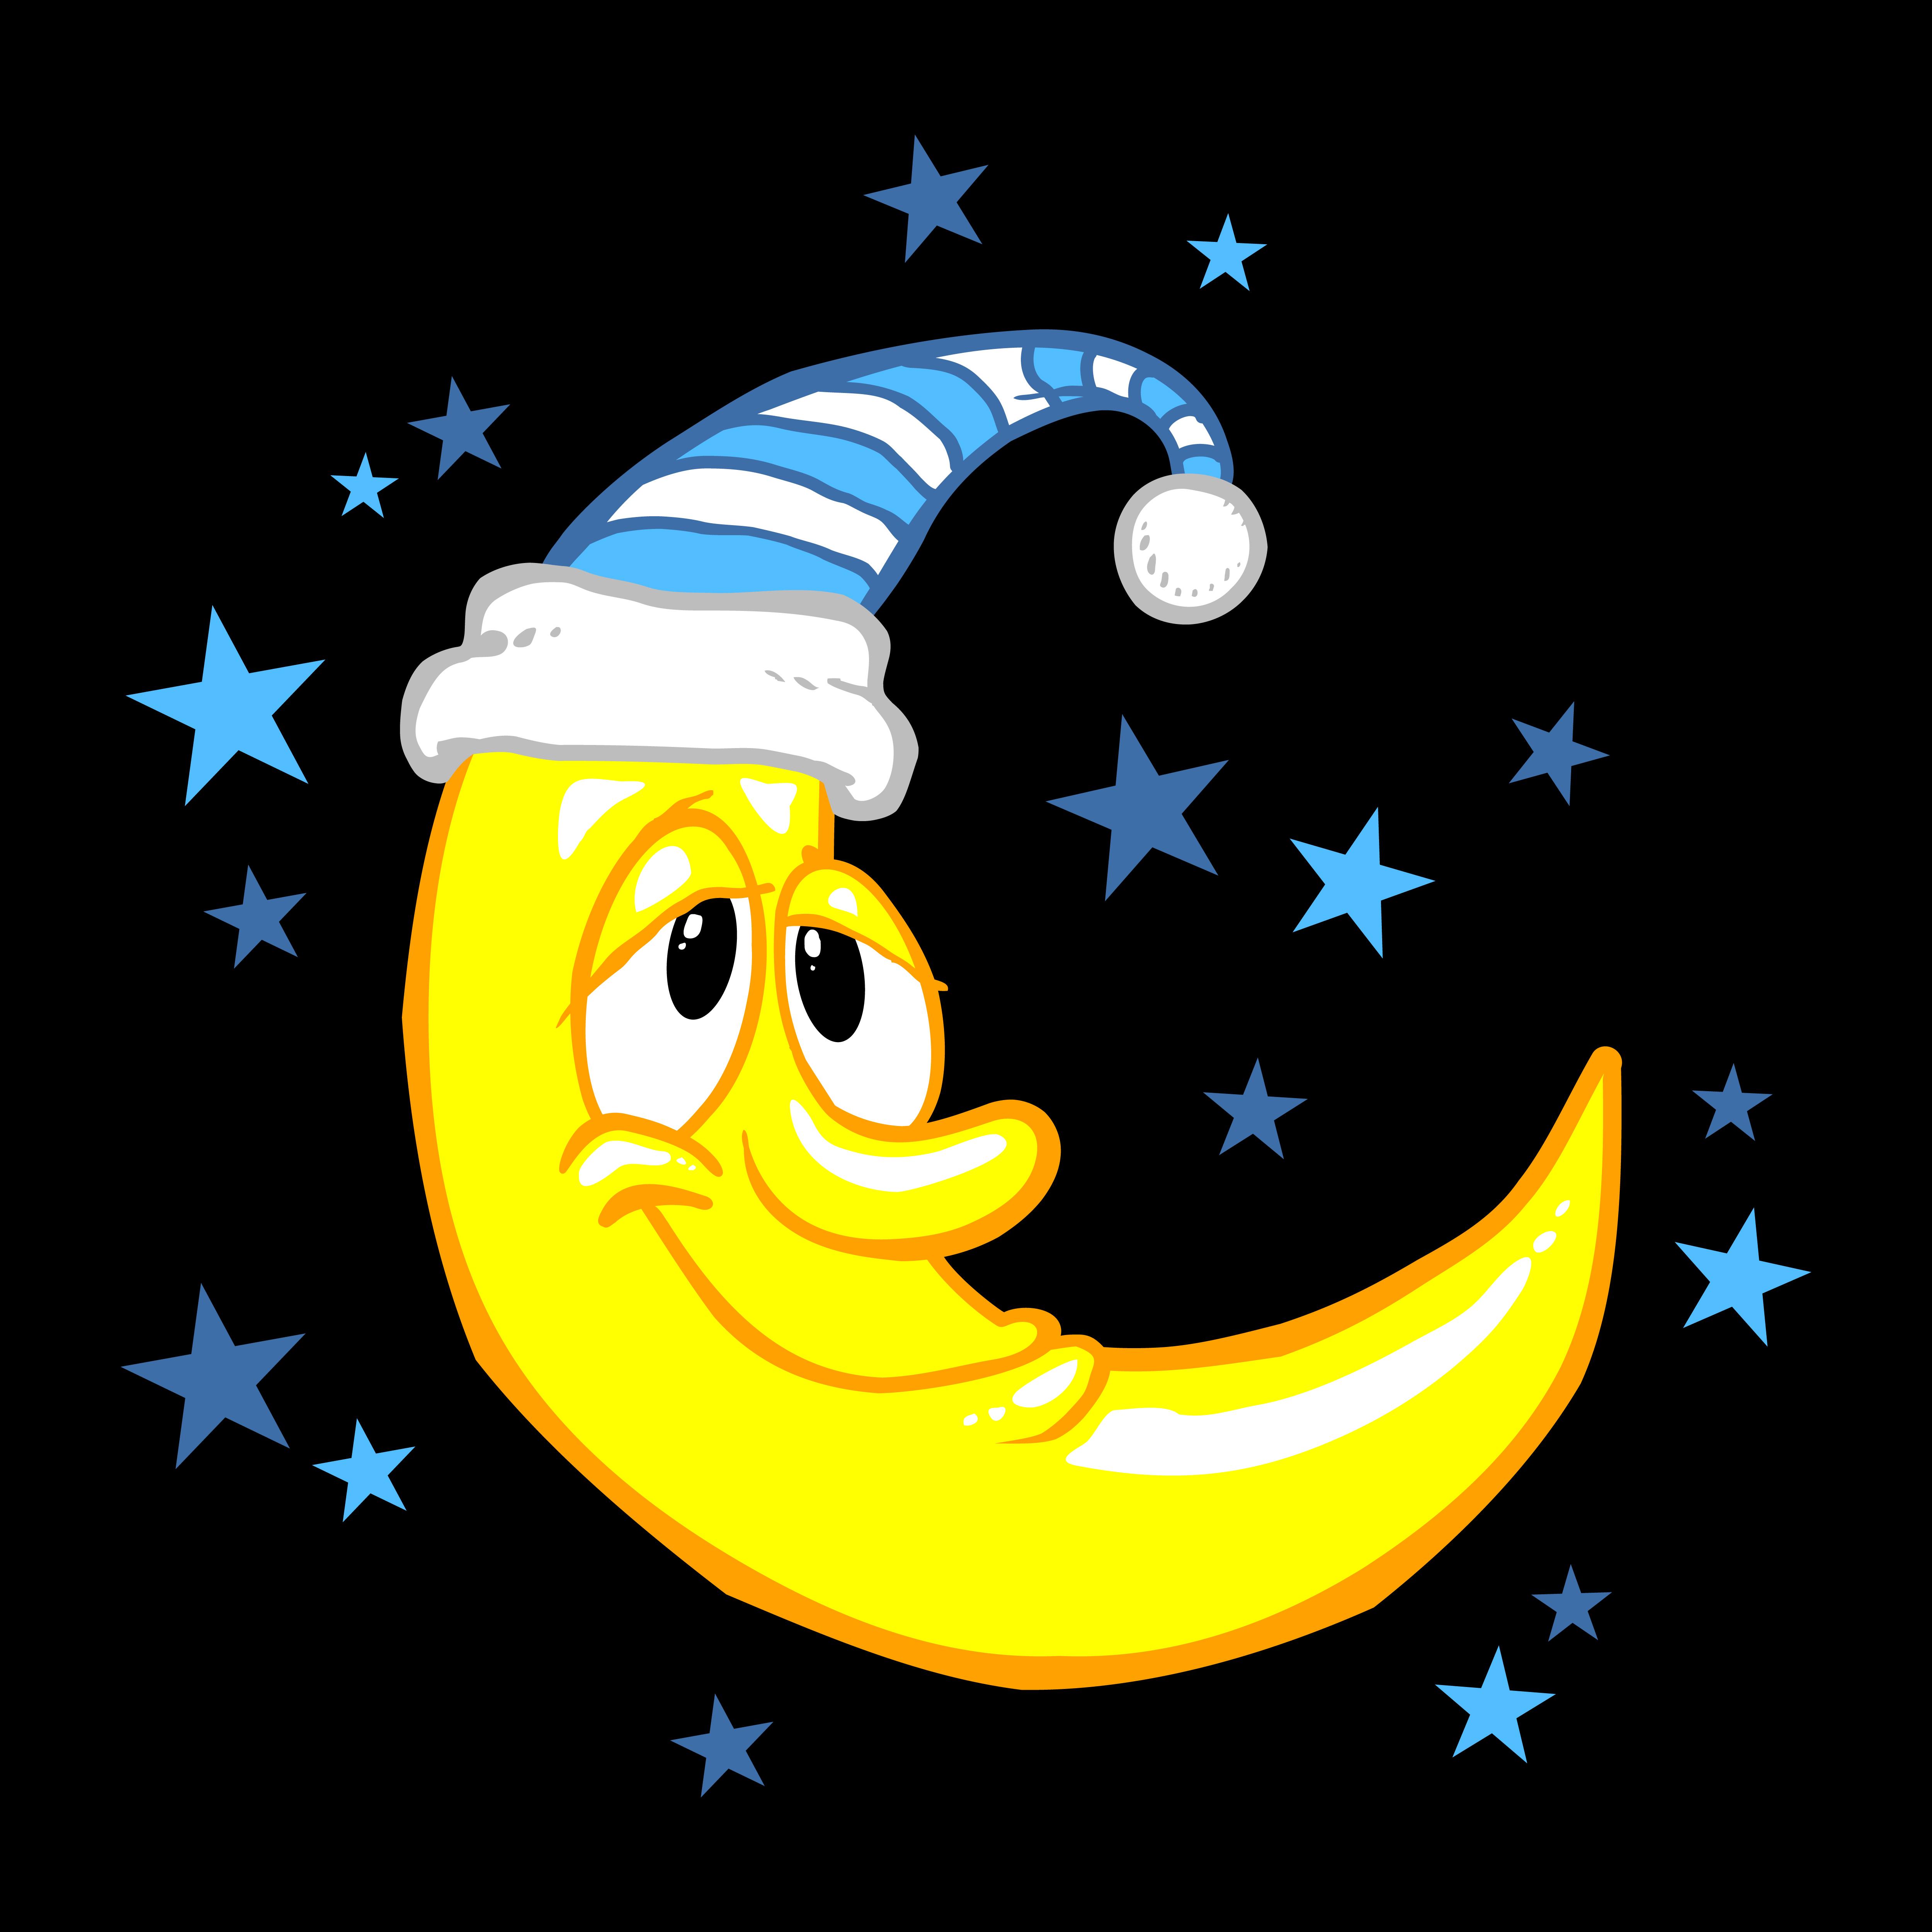 Moon smiling cartoon vector illustration 551529 - Download ... (5000 x 5000 Pixel)